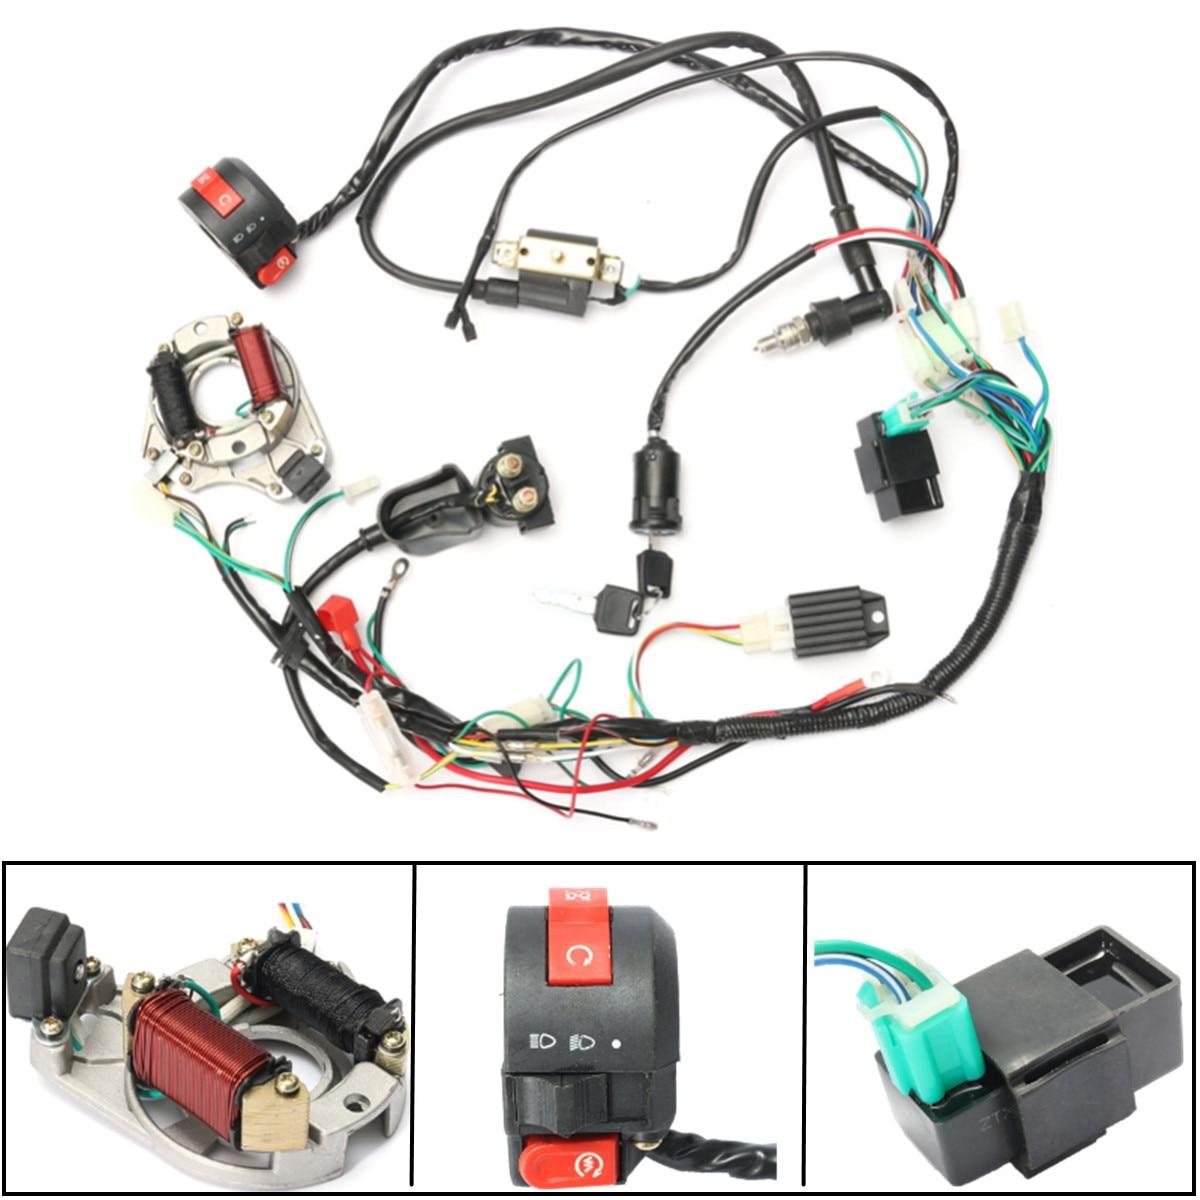 cdi wire harness stator assembly wiring for atv electric quad 50cc 70cc 90cc 110cc 125cc [ 1200 x 1200 Pixel ]